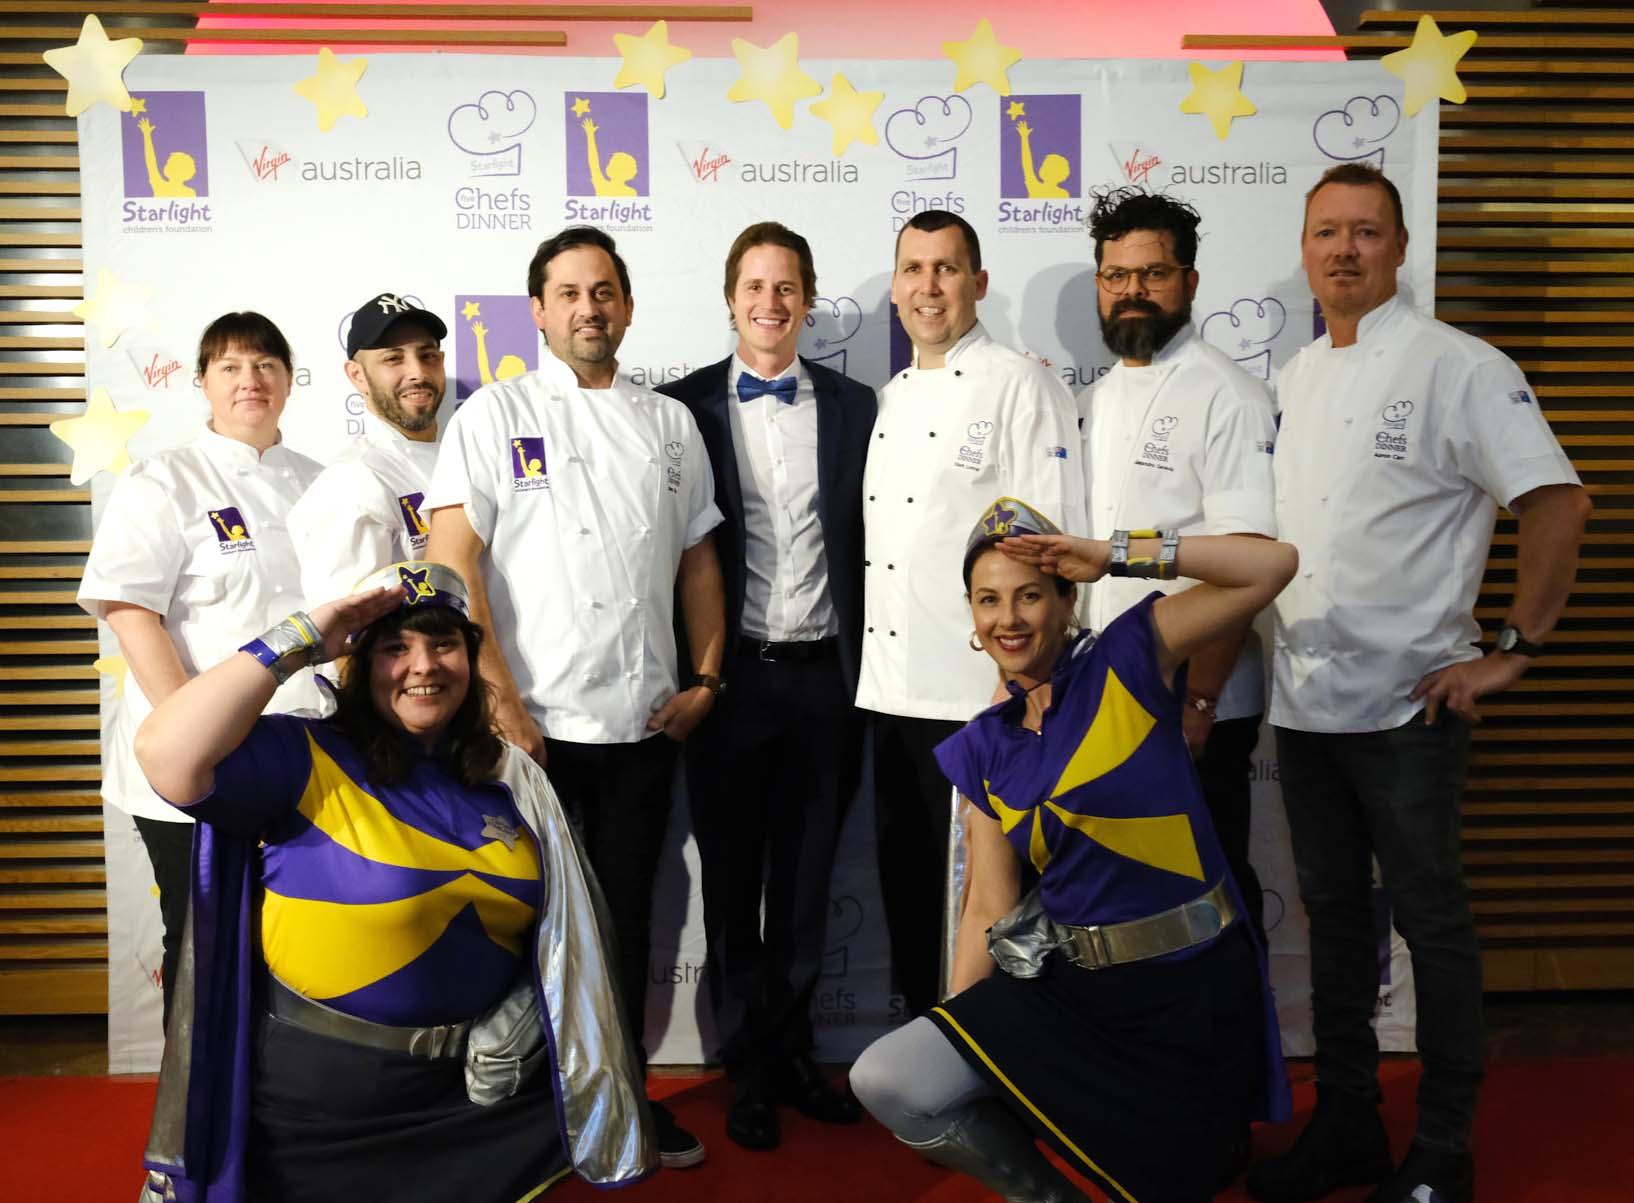 Starlight Five Chefs - Chefs.jpg